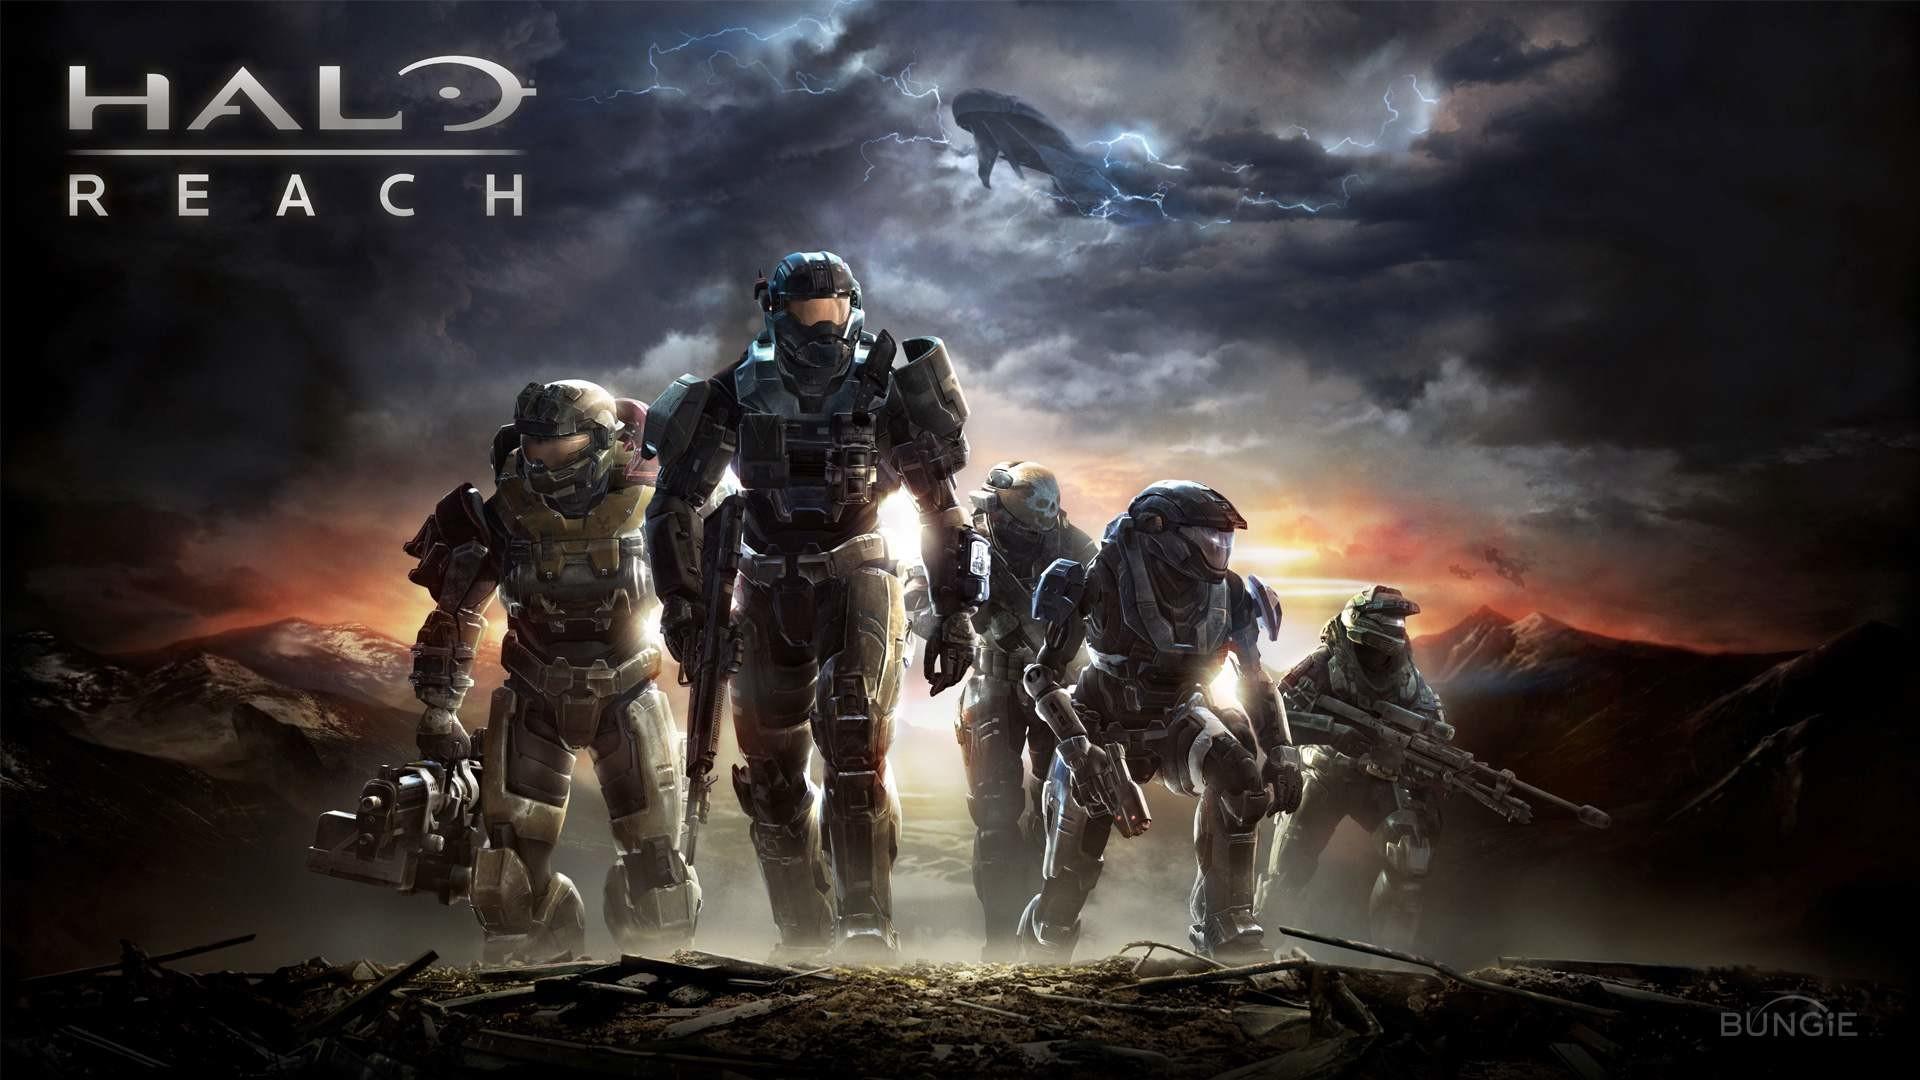 Res: 1920x1080, Halo Reach 1080p Wallpaper ...